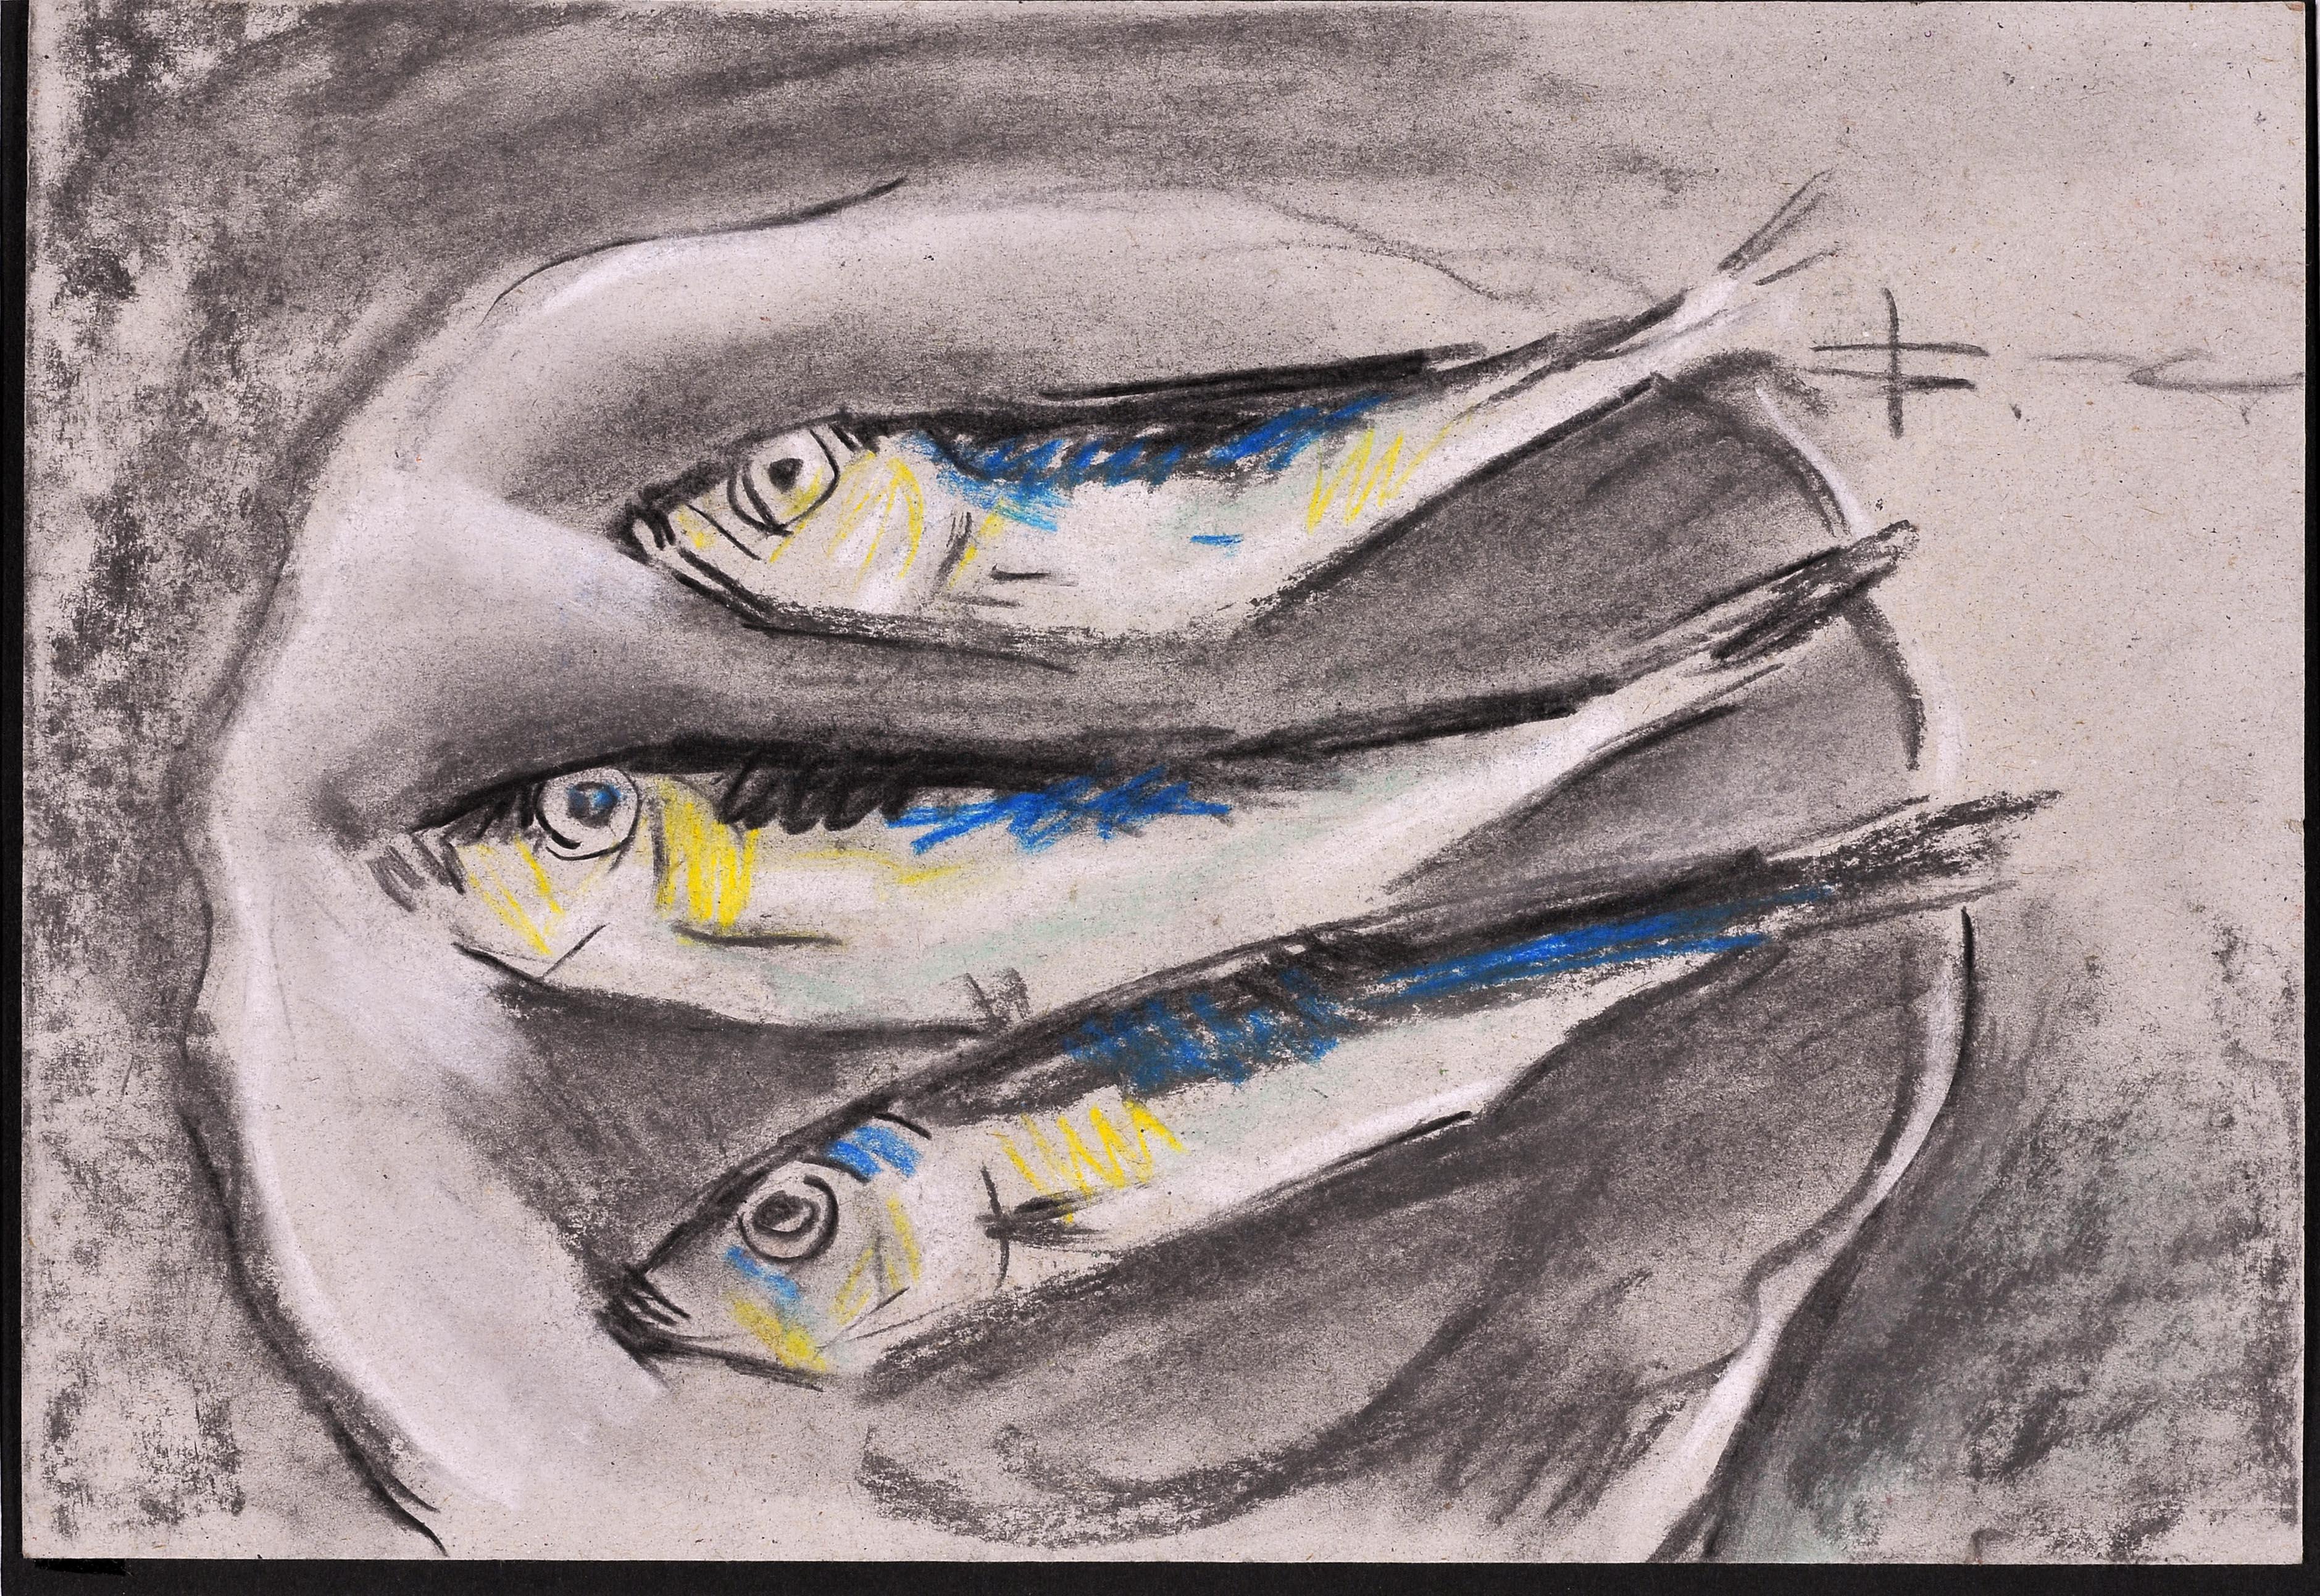 В.Хрущ Рыбки. 2000. Б.,см.т. 20,3 х 29,6. Одесса, Б/см.т. Одесса, Галерея NT-Art